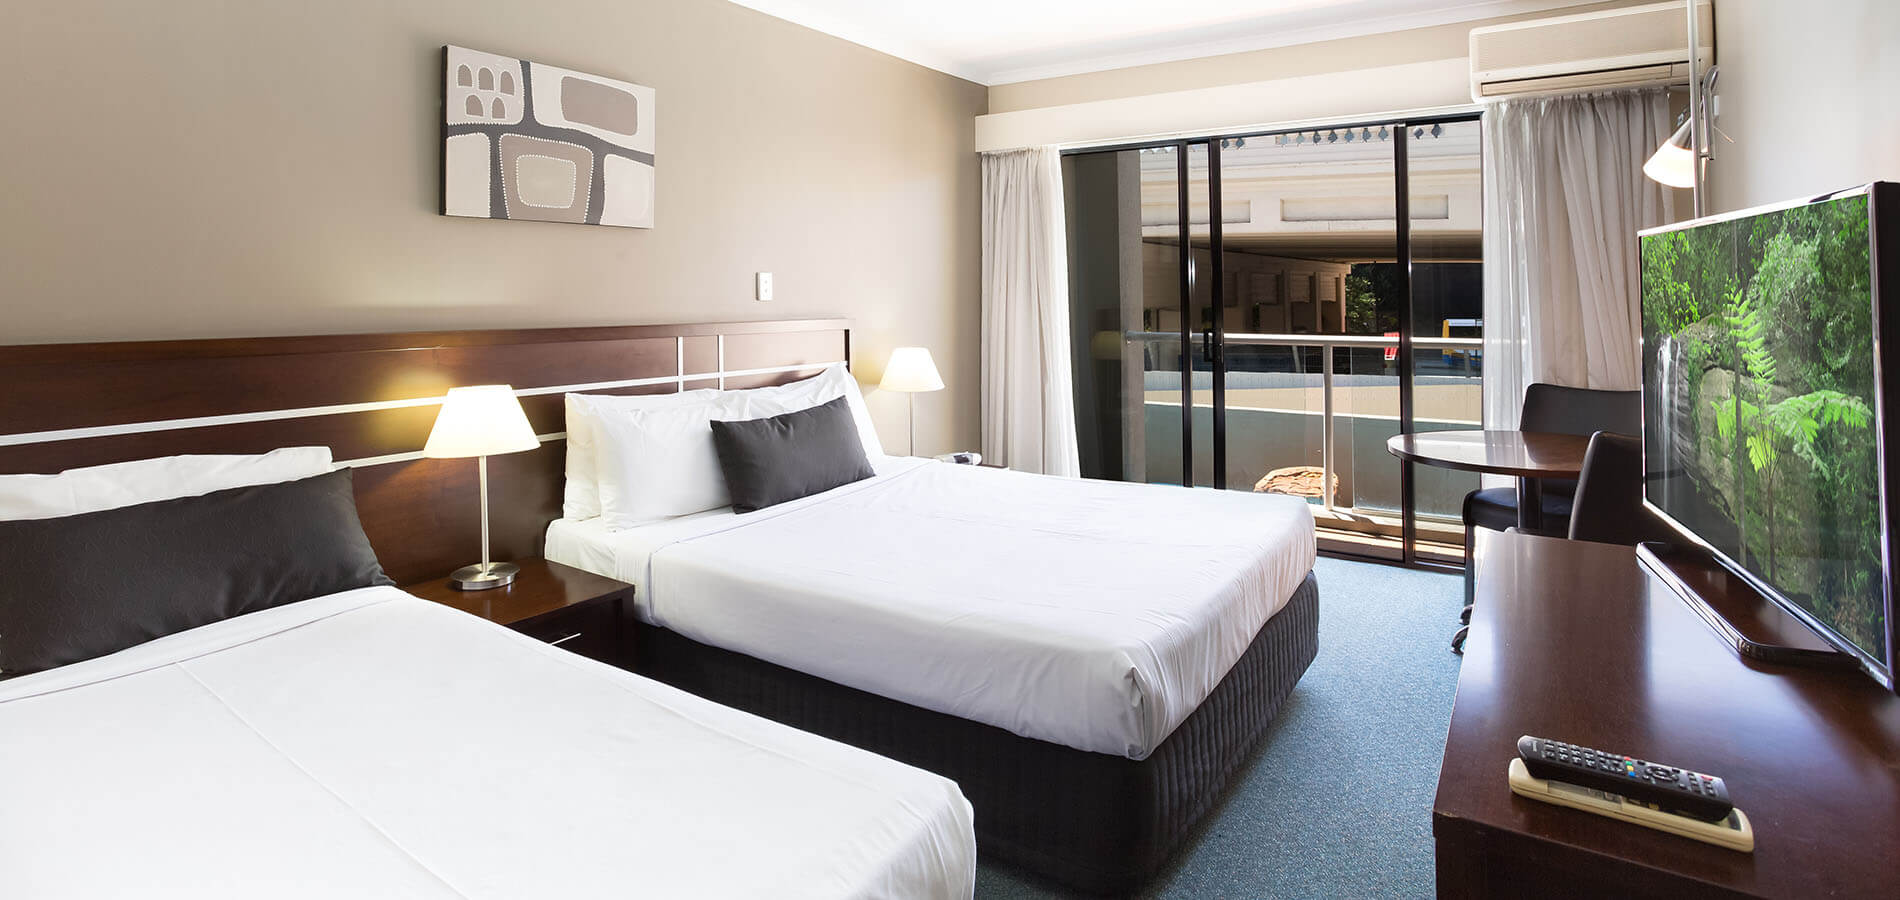 广州酒店家具厂